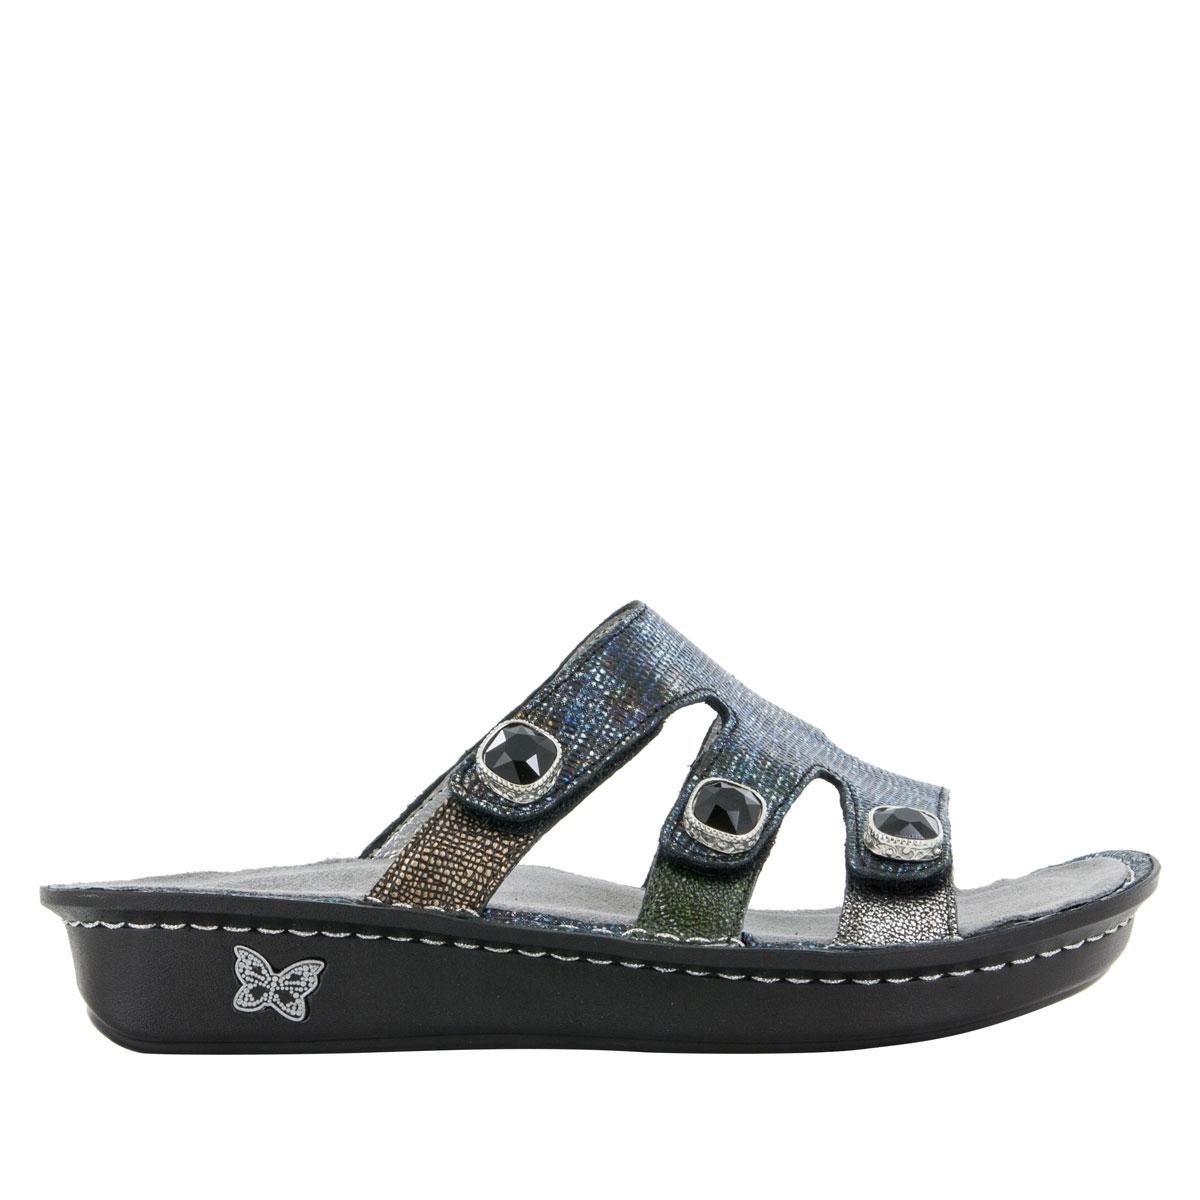 24568d5b635 Venice Glimmer Glam Sandals - Alegria Shoes